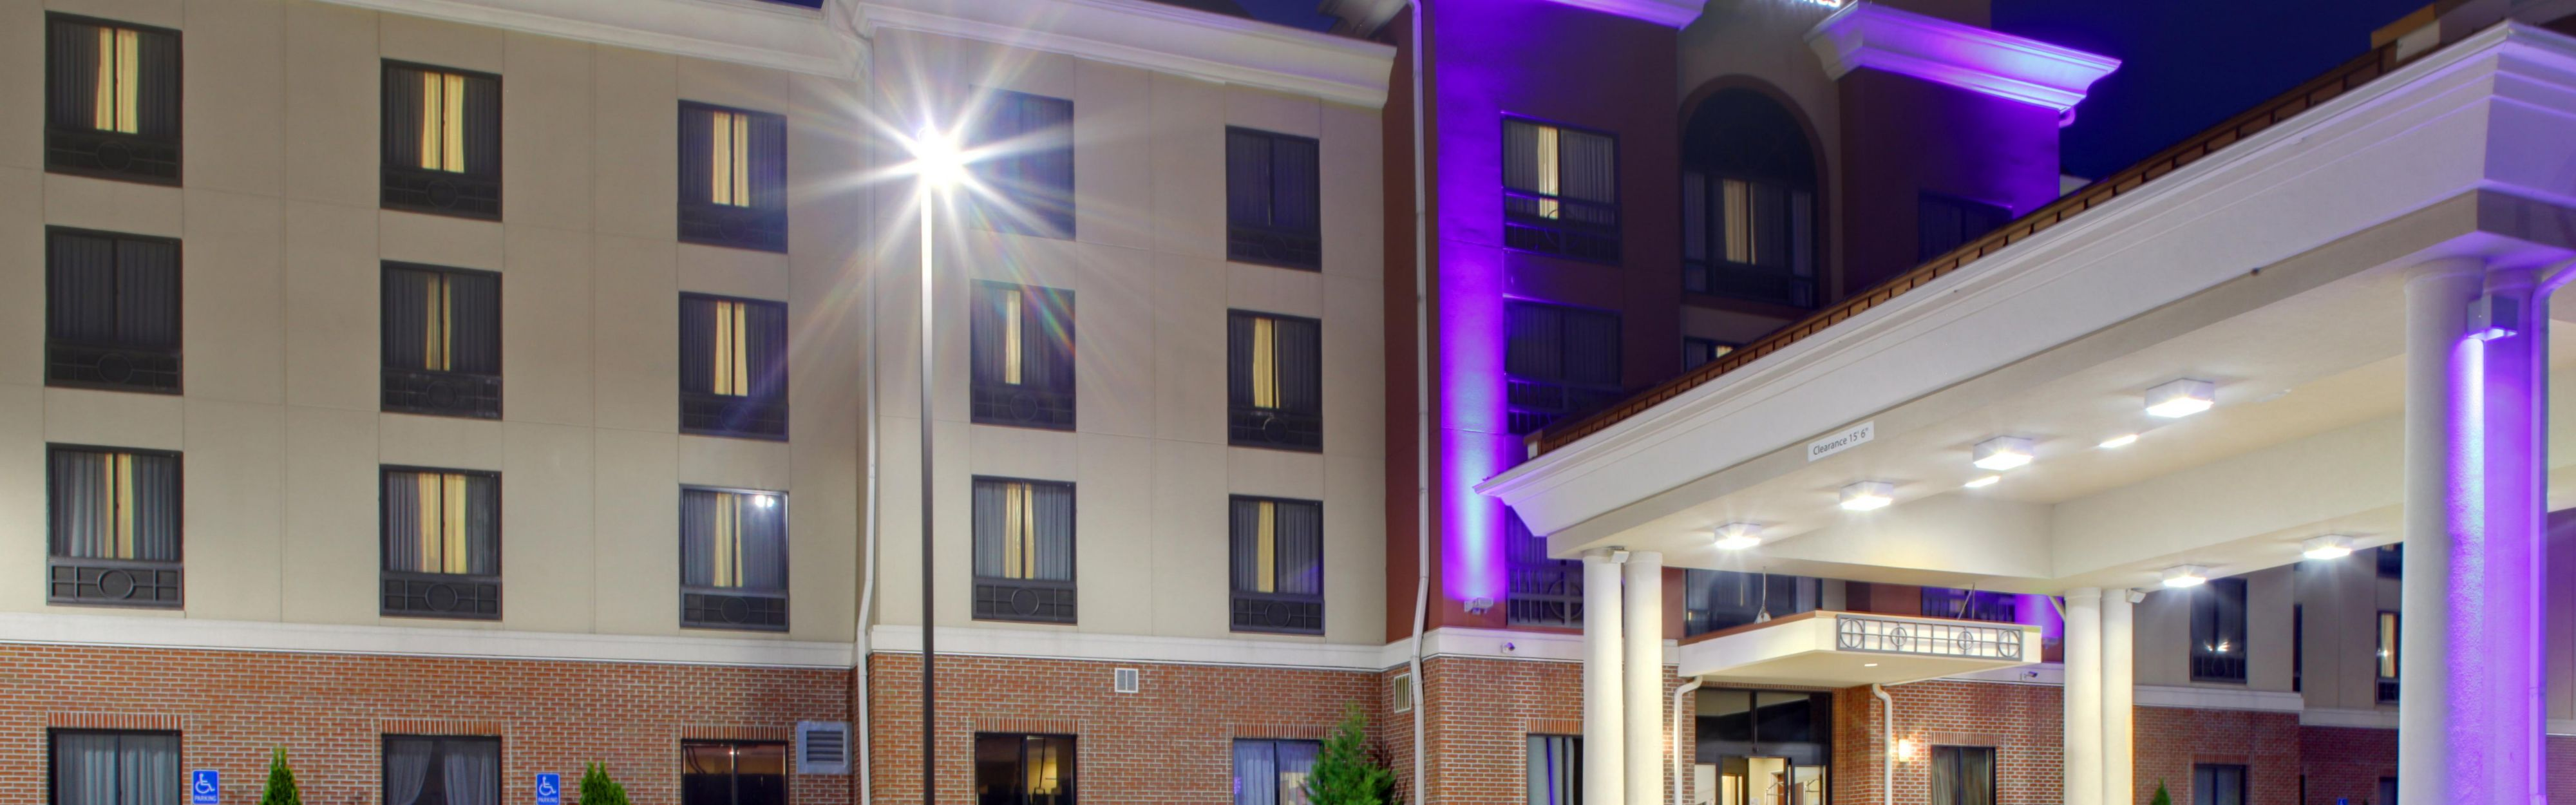 Holiday Inn Express & Suites Charleston NW - Cross Lanes image 0